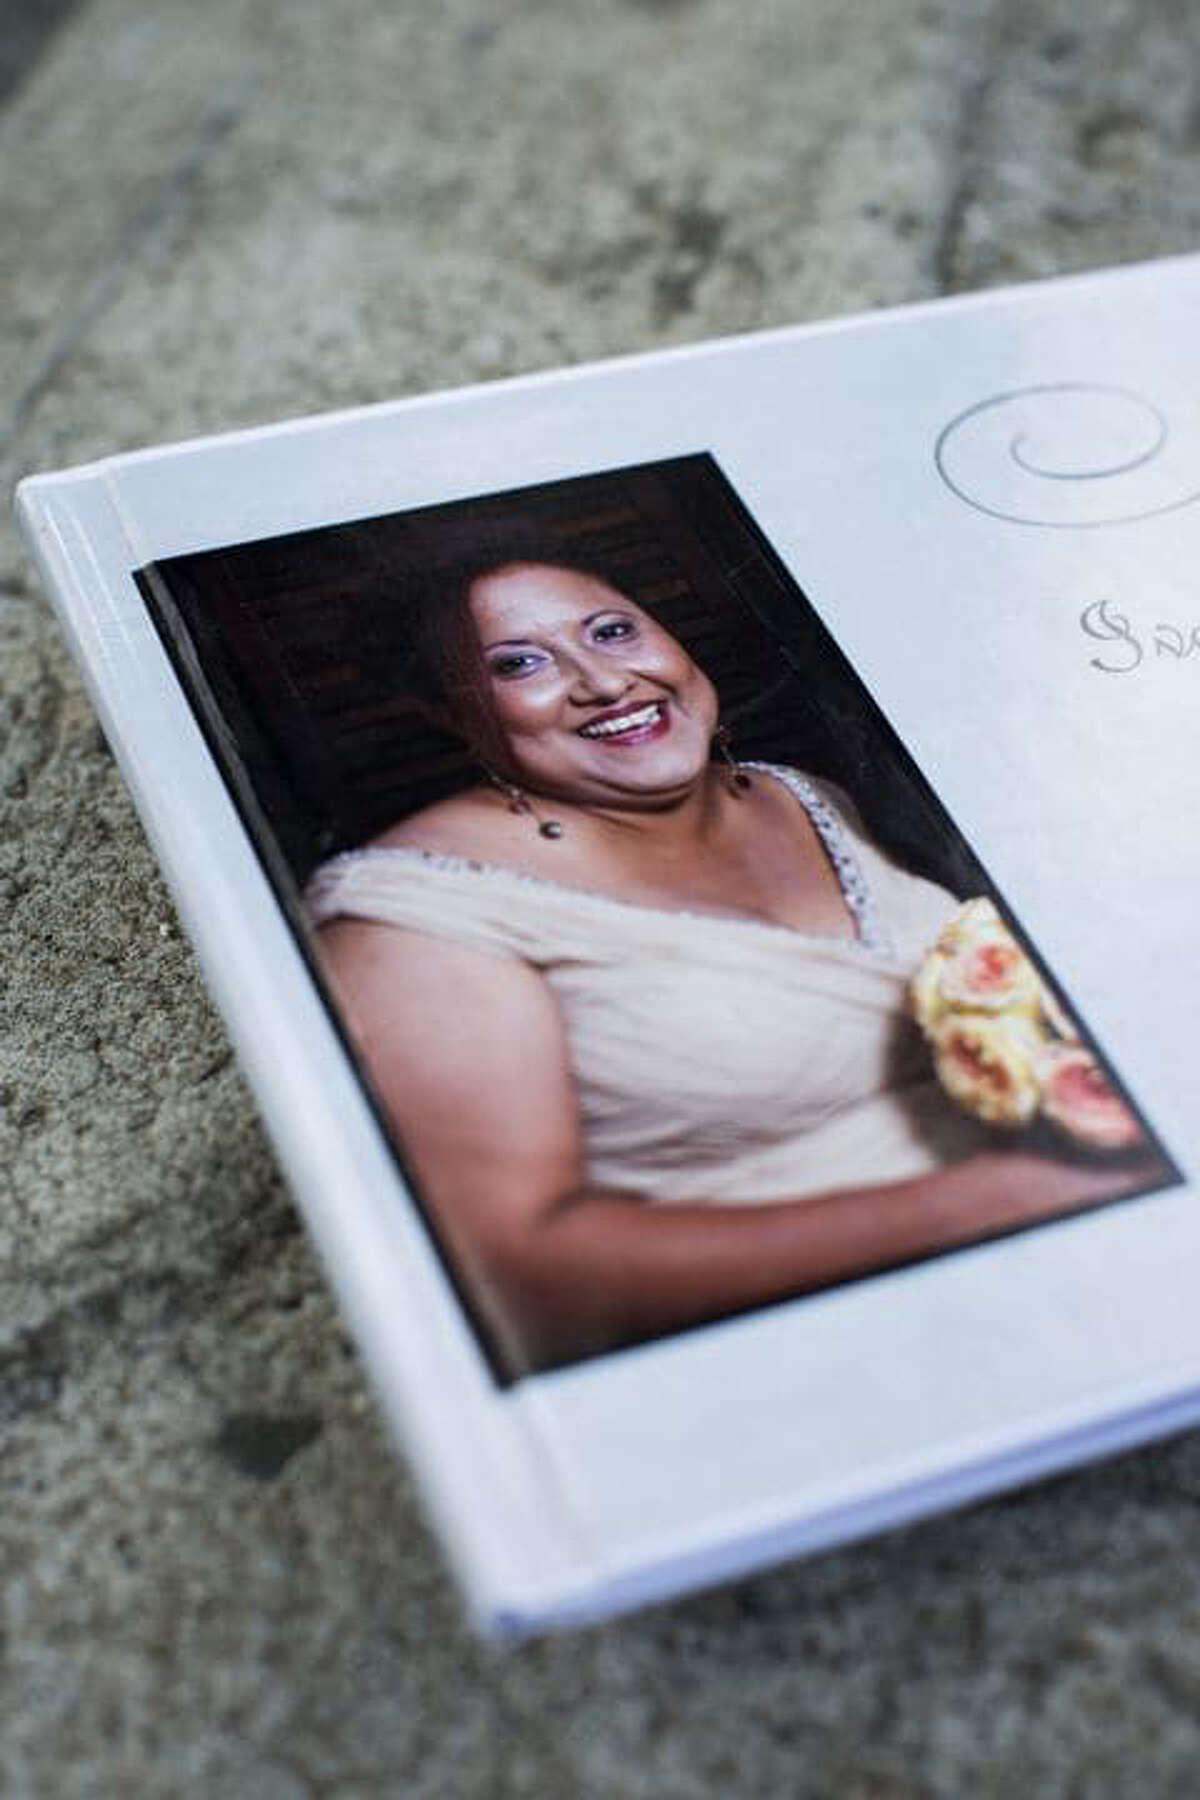 A memorial book for Ivette Leon.